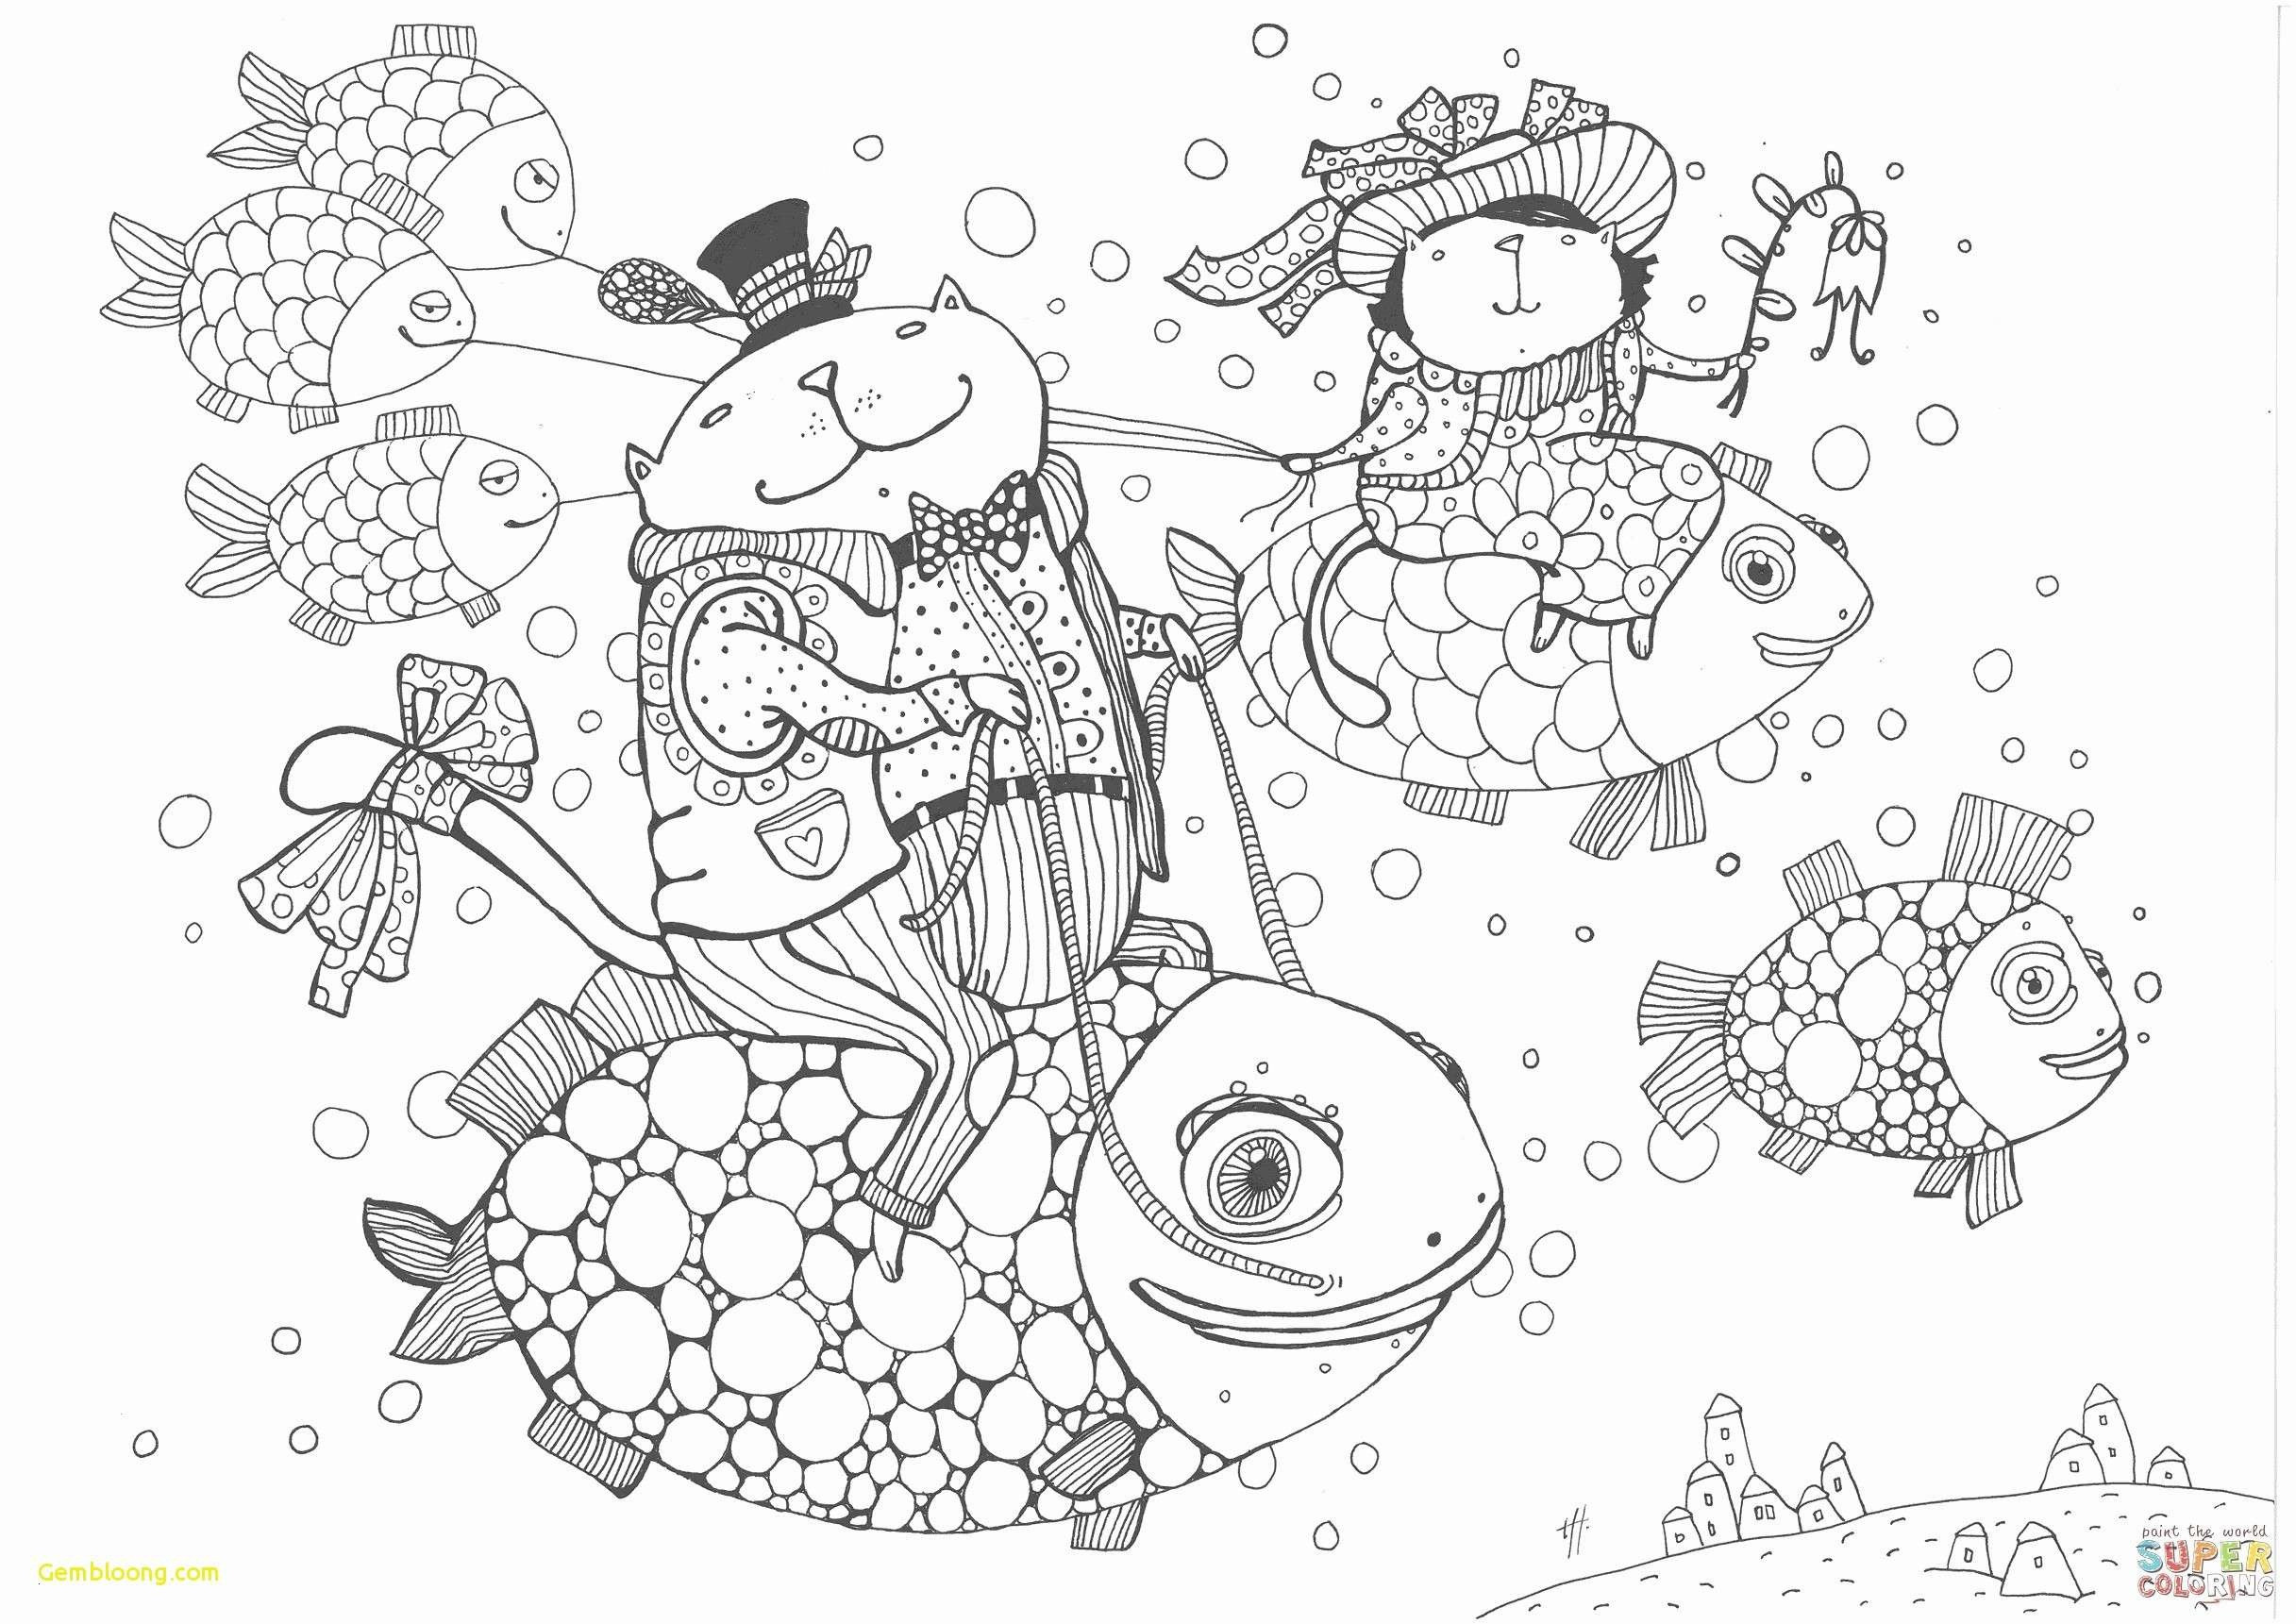 Micky Maus Malvorlagen Inspirierend 35 Pilze Malvorlagen Scoredatscore Best Micky Maus Ausmalbilder Stock